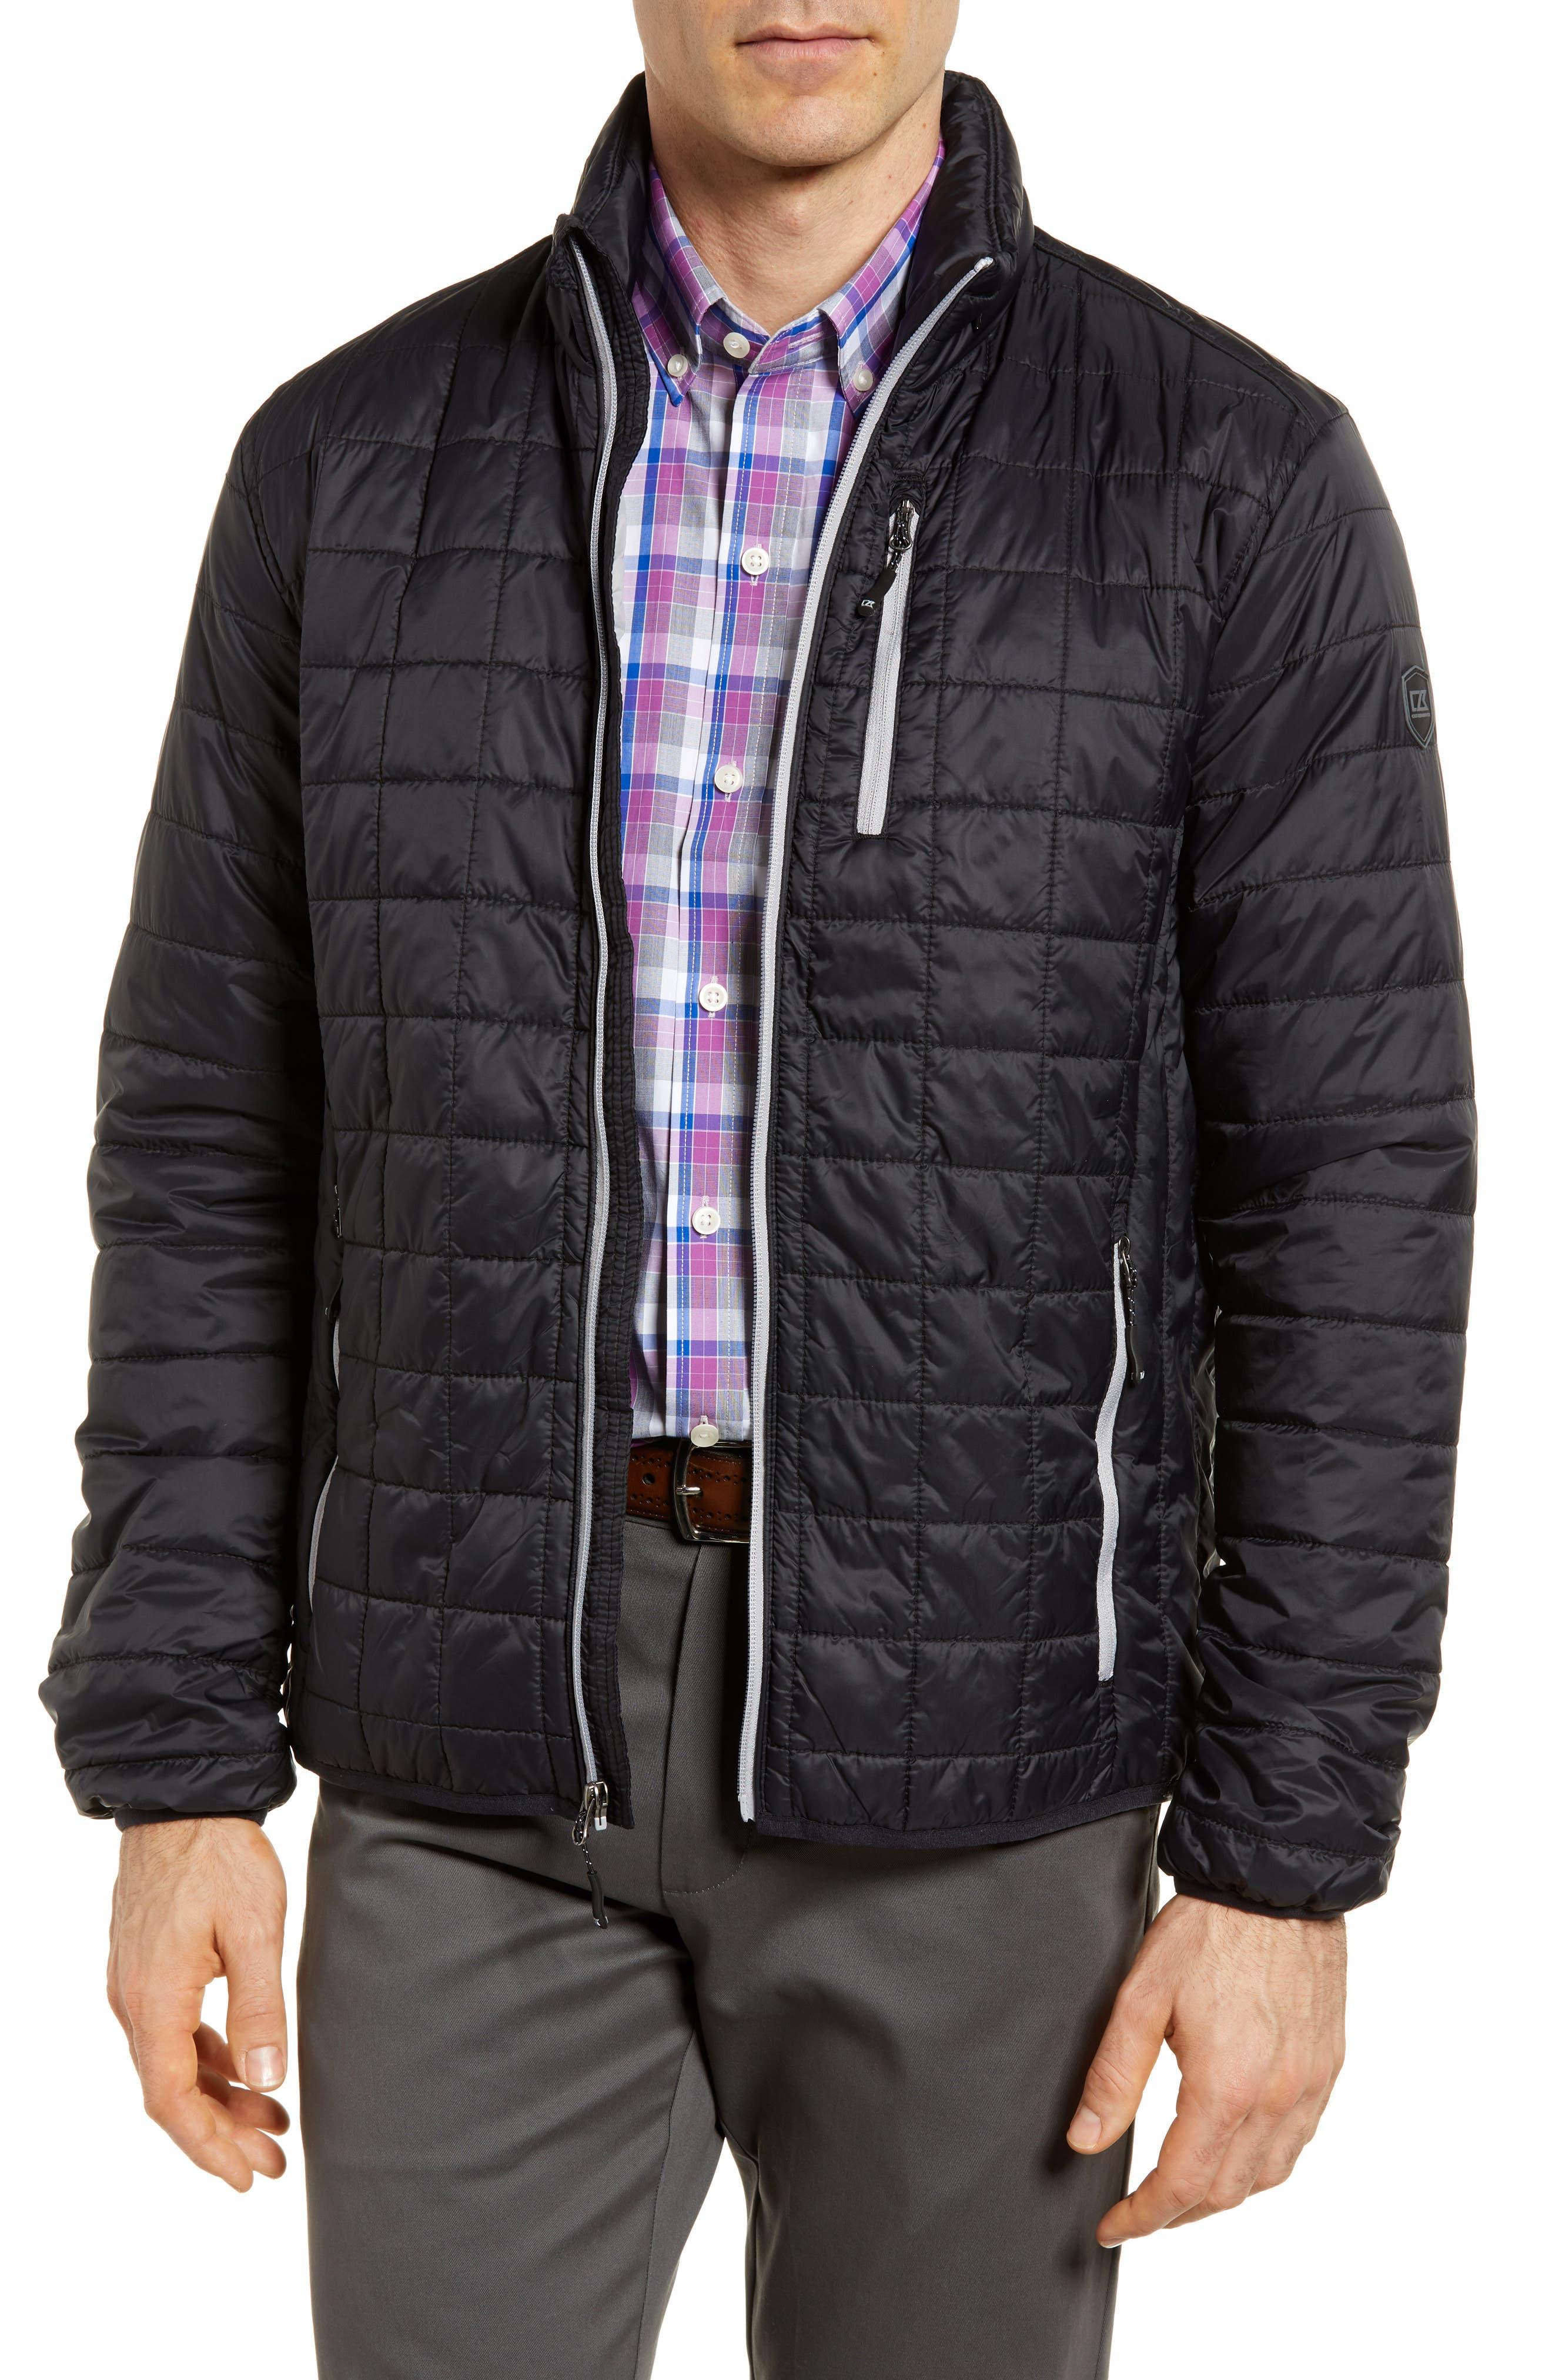 Cutter & Buck Rainier Classic Fit Jacket, Black